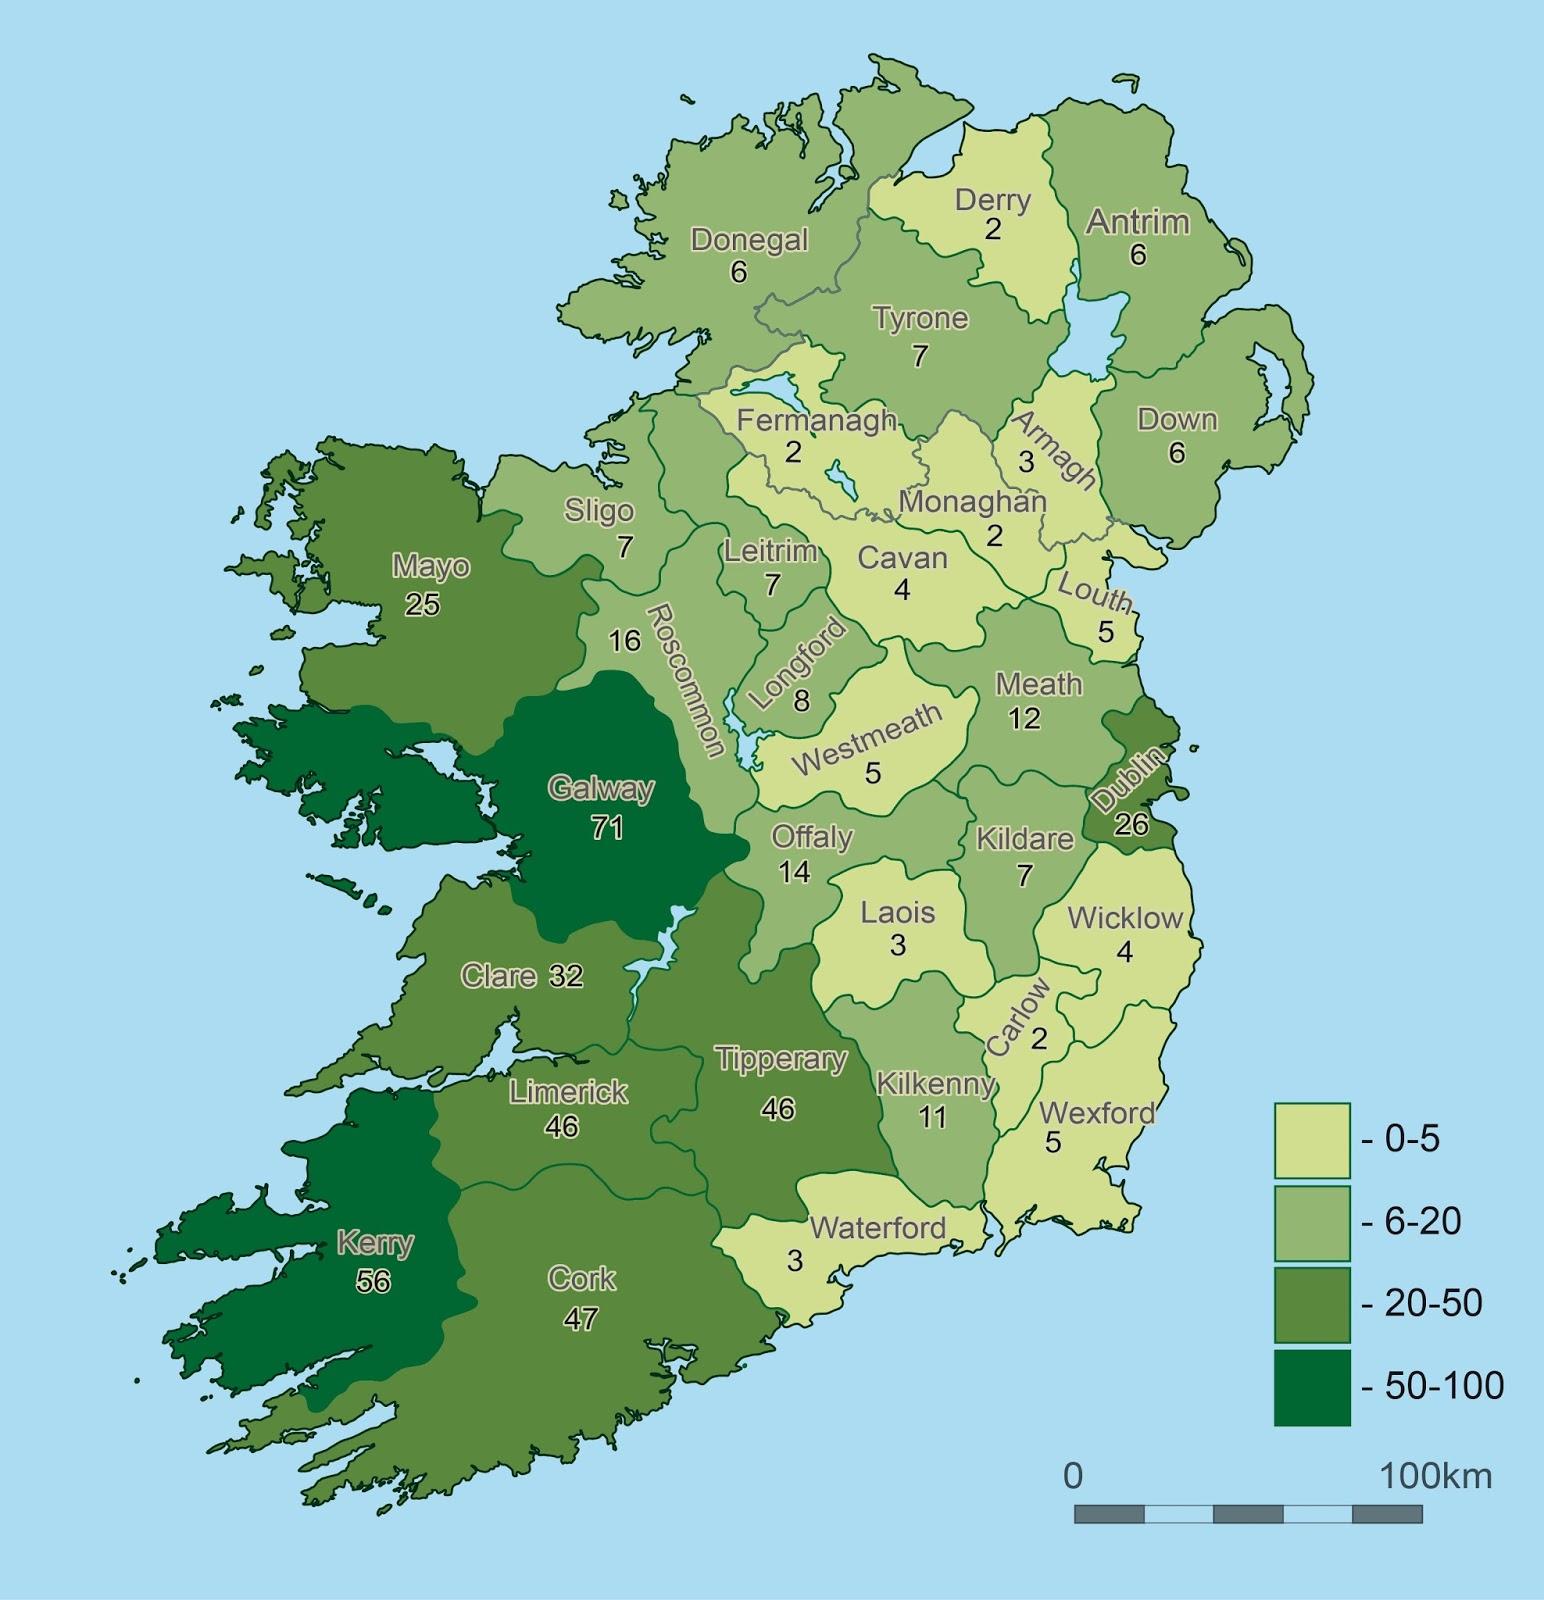 Ireland Geography Map